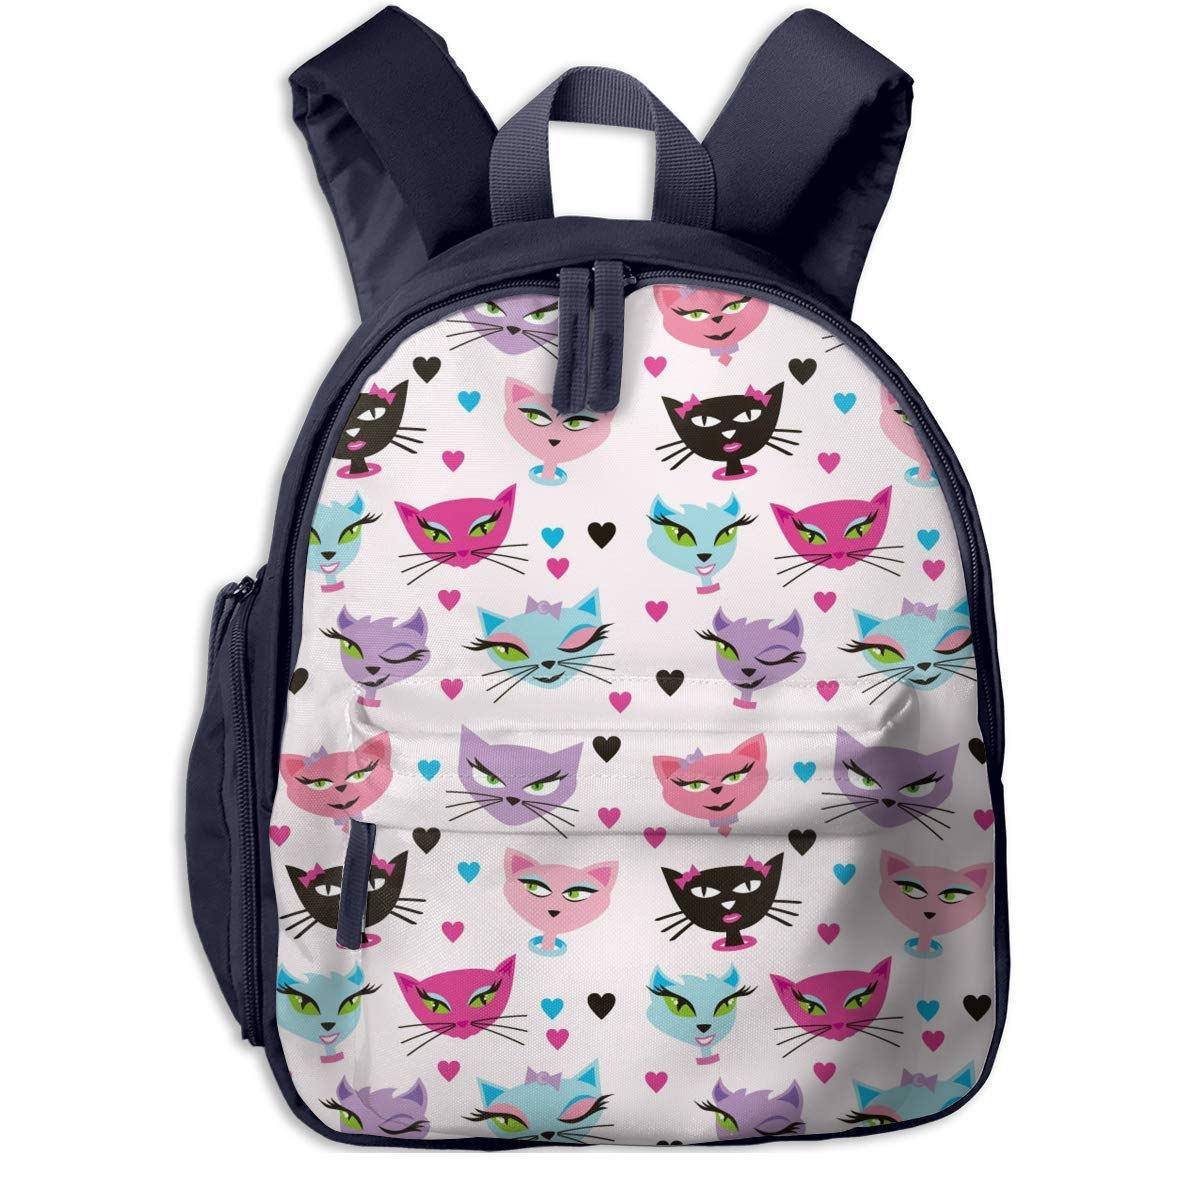 Sd4r5y3hg School Backpack for Girls Boys, Kids Cute Cute Cute Carttoon Cat Cartoon Backpacks Book Bag B07M9M65GS Daypacks Klassischer Stil 1f9518